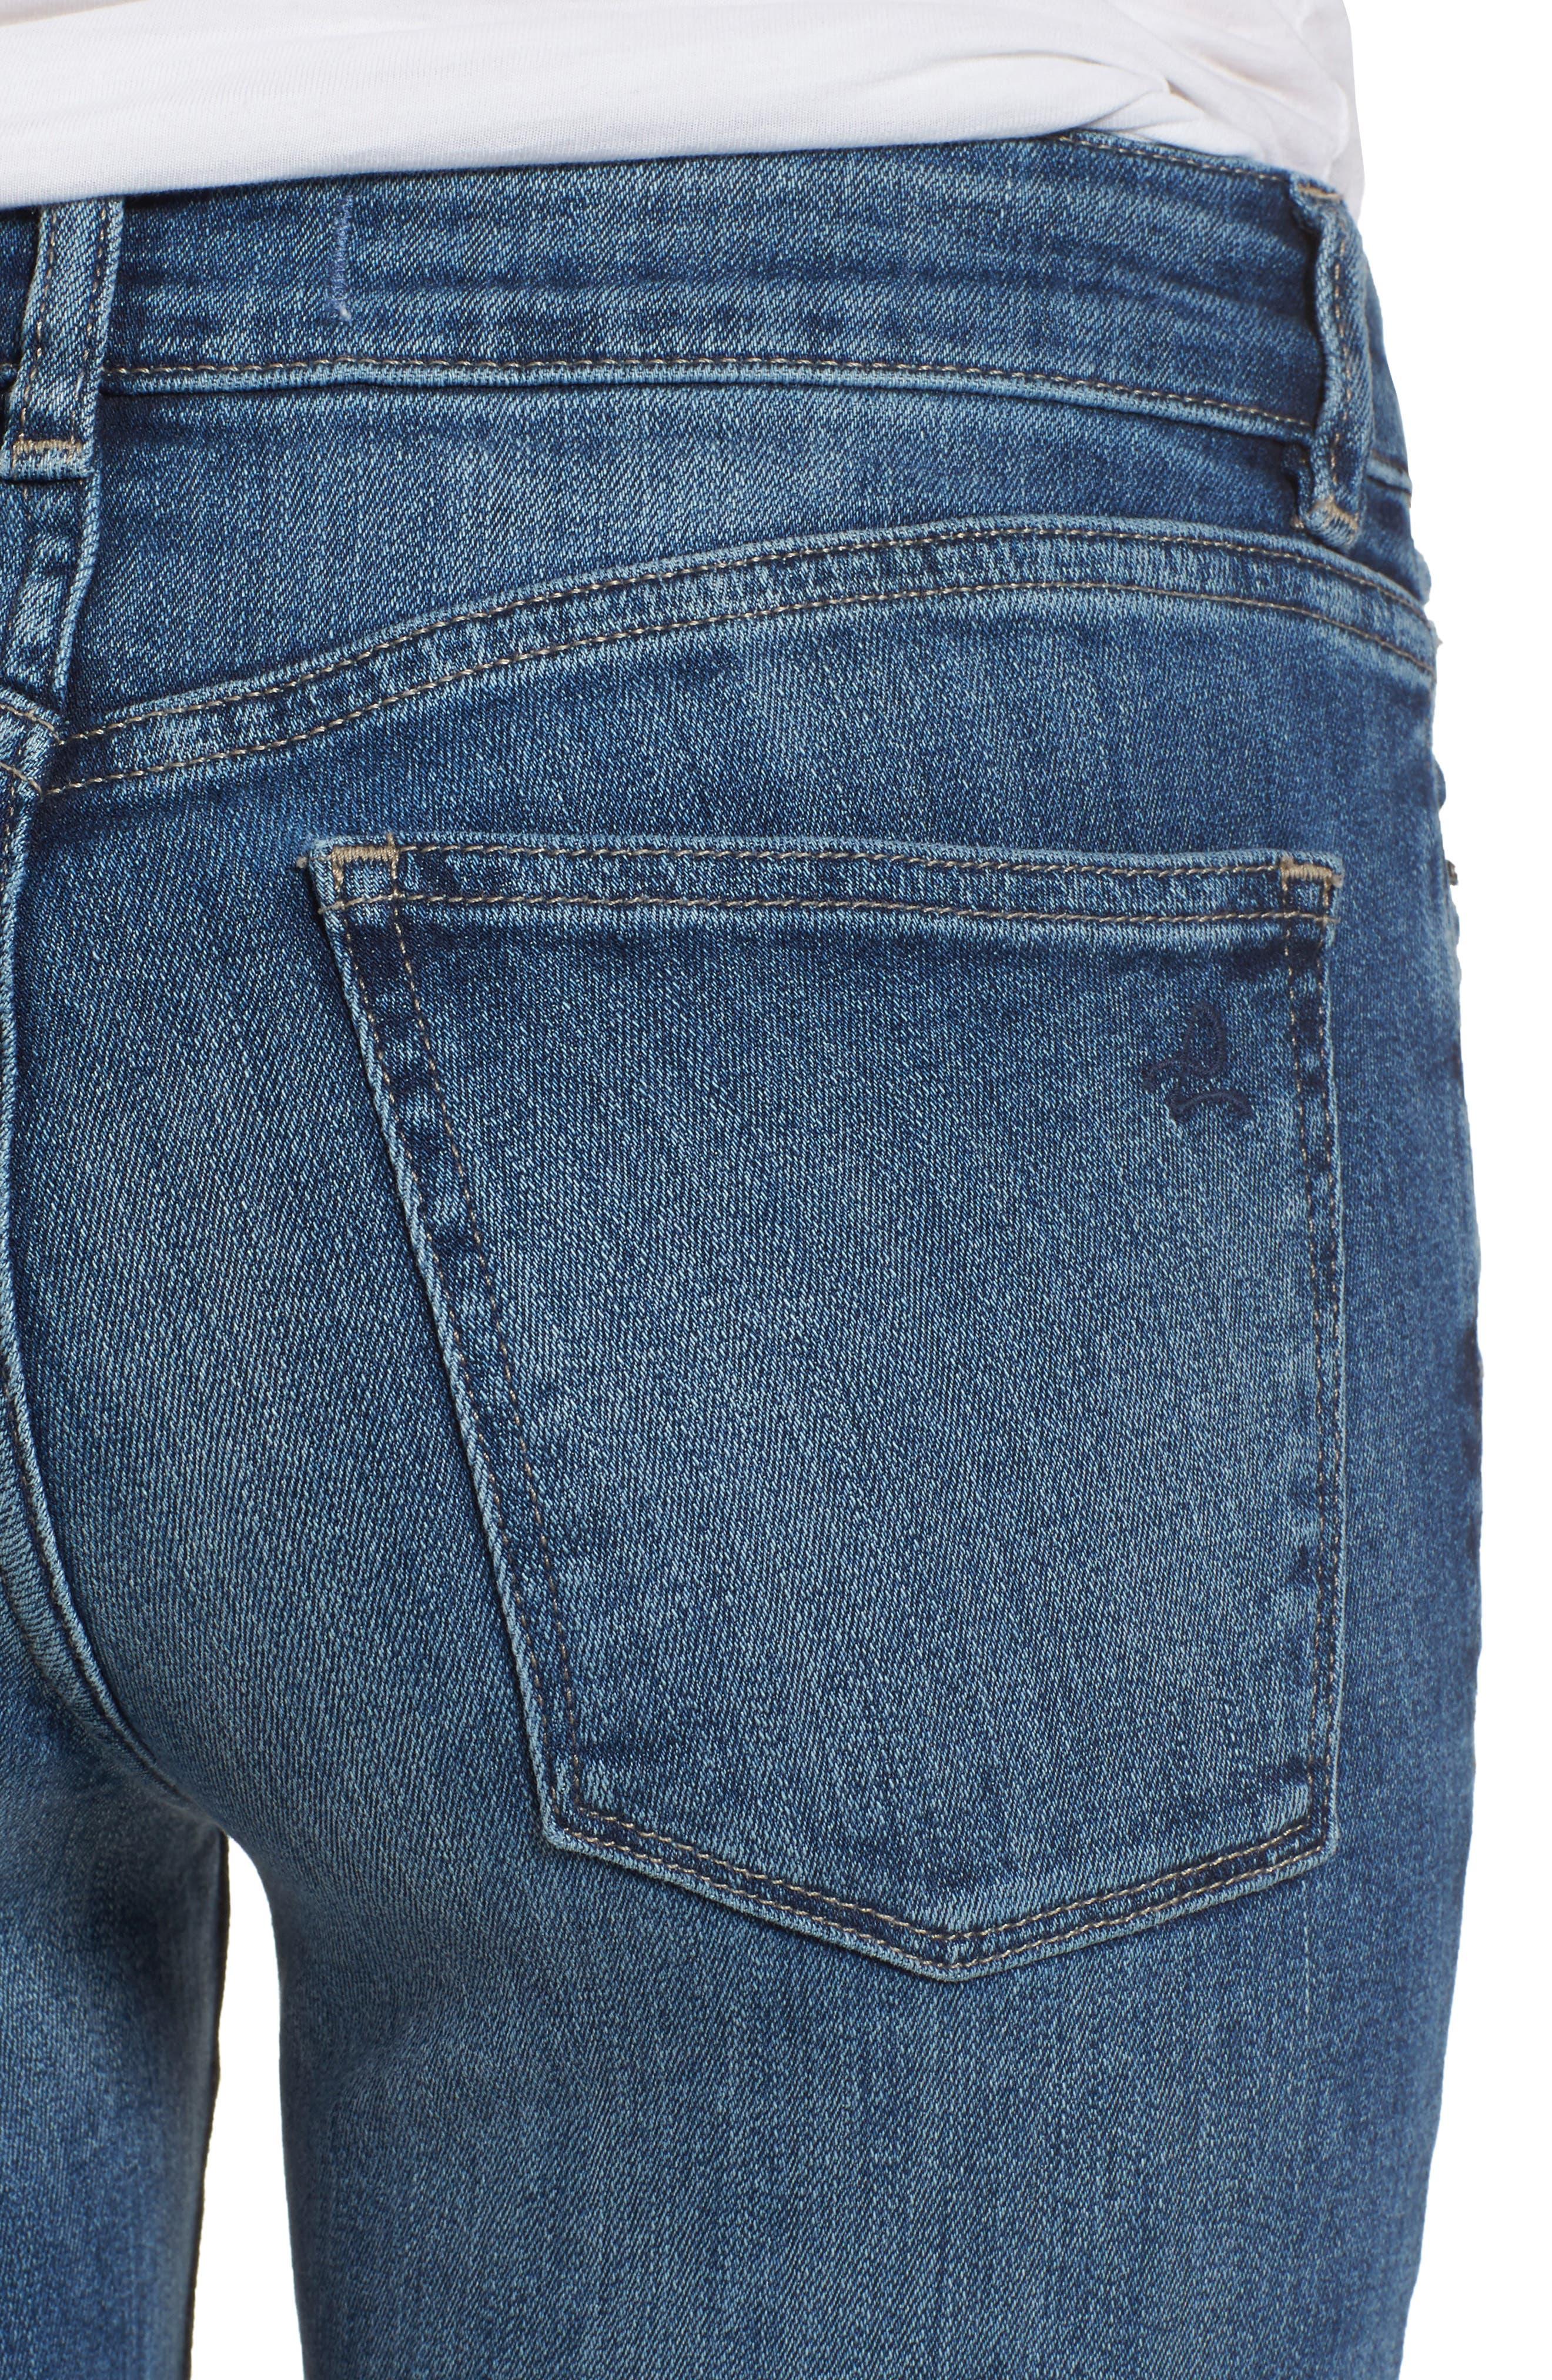 Florence Instasculpt Skinny Jeans,                             Alternate thumbnail 4, color,                             405